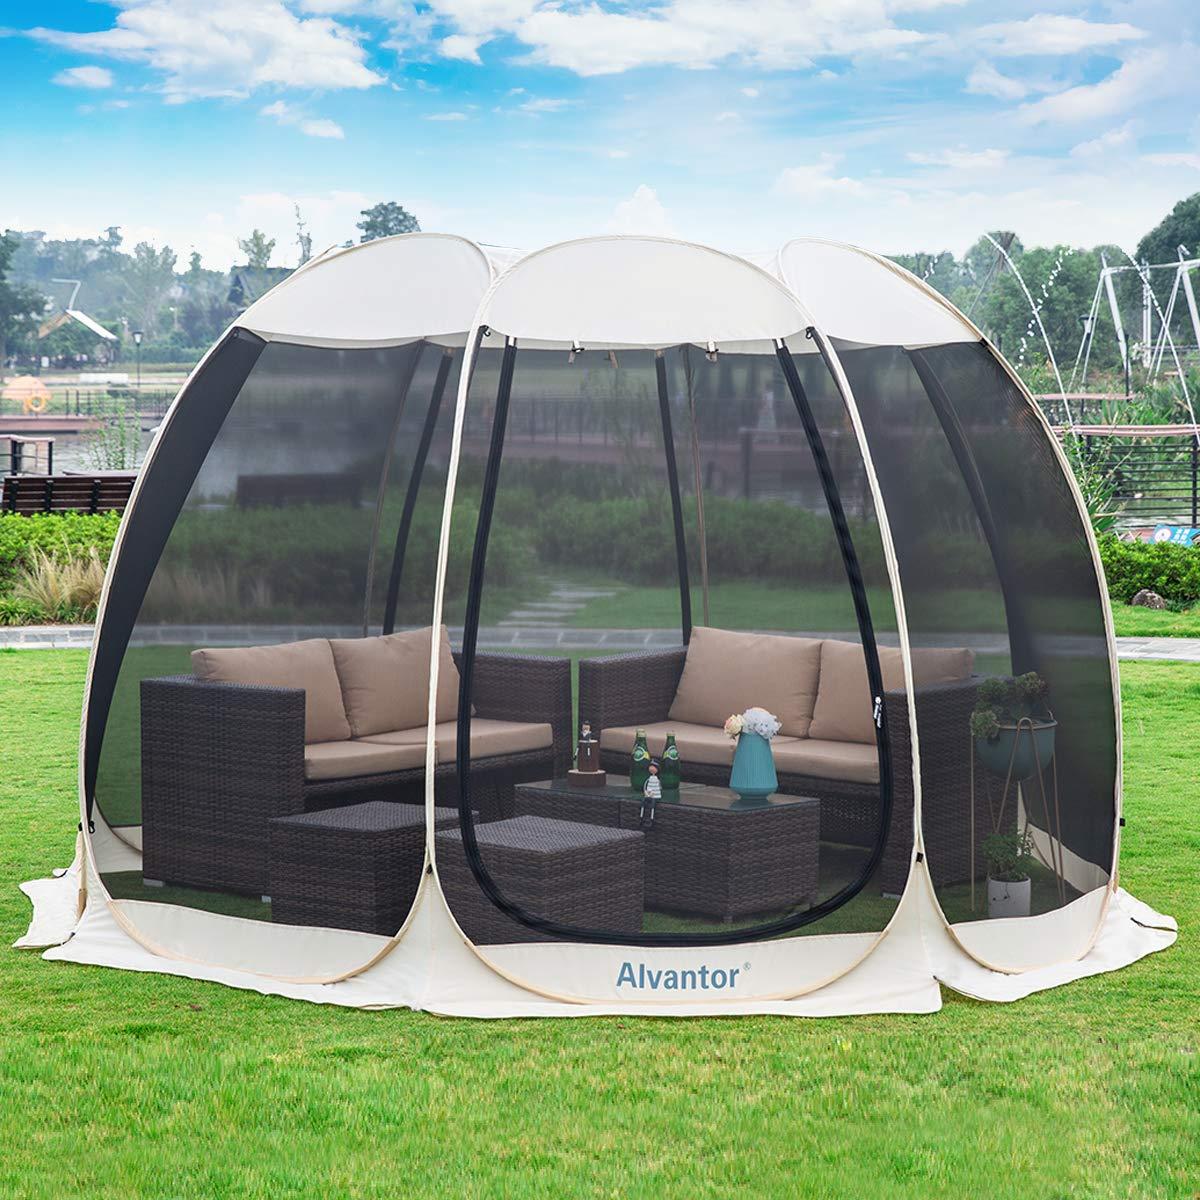 Alvantor Screen House Room Camping Tent Outdoor Canopy Dining Gazebo Pop Up Sun Shade Shelter 8 Mesh Walls Not Waterproof Ecru 12'x12'x7.5' Patent by Alvantor